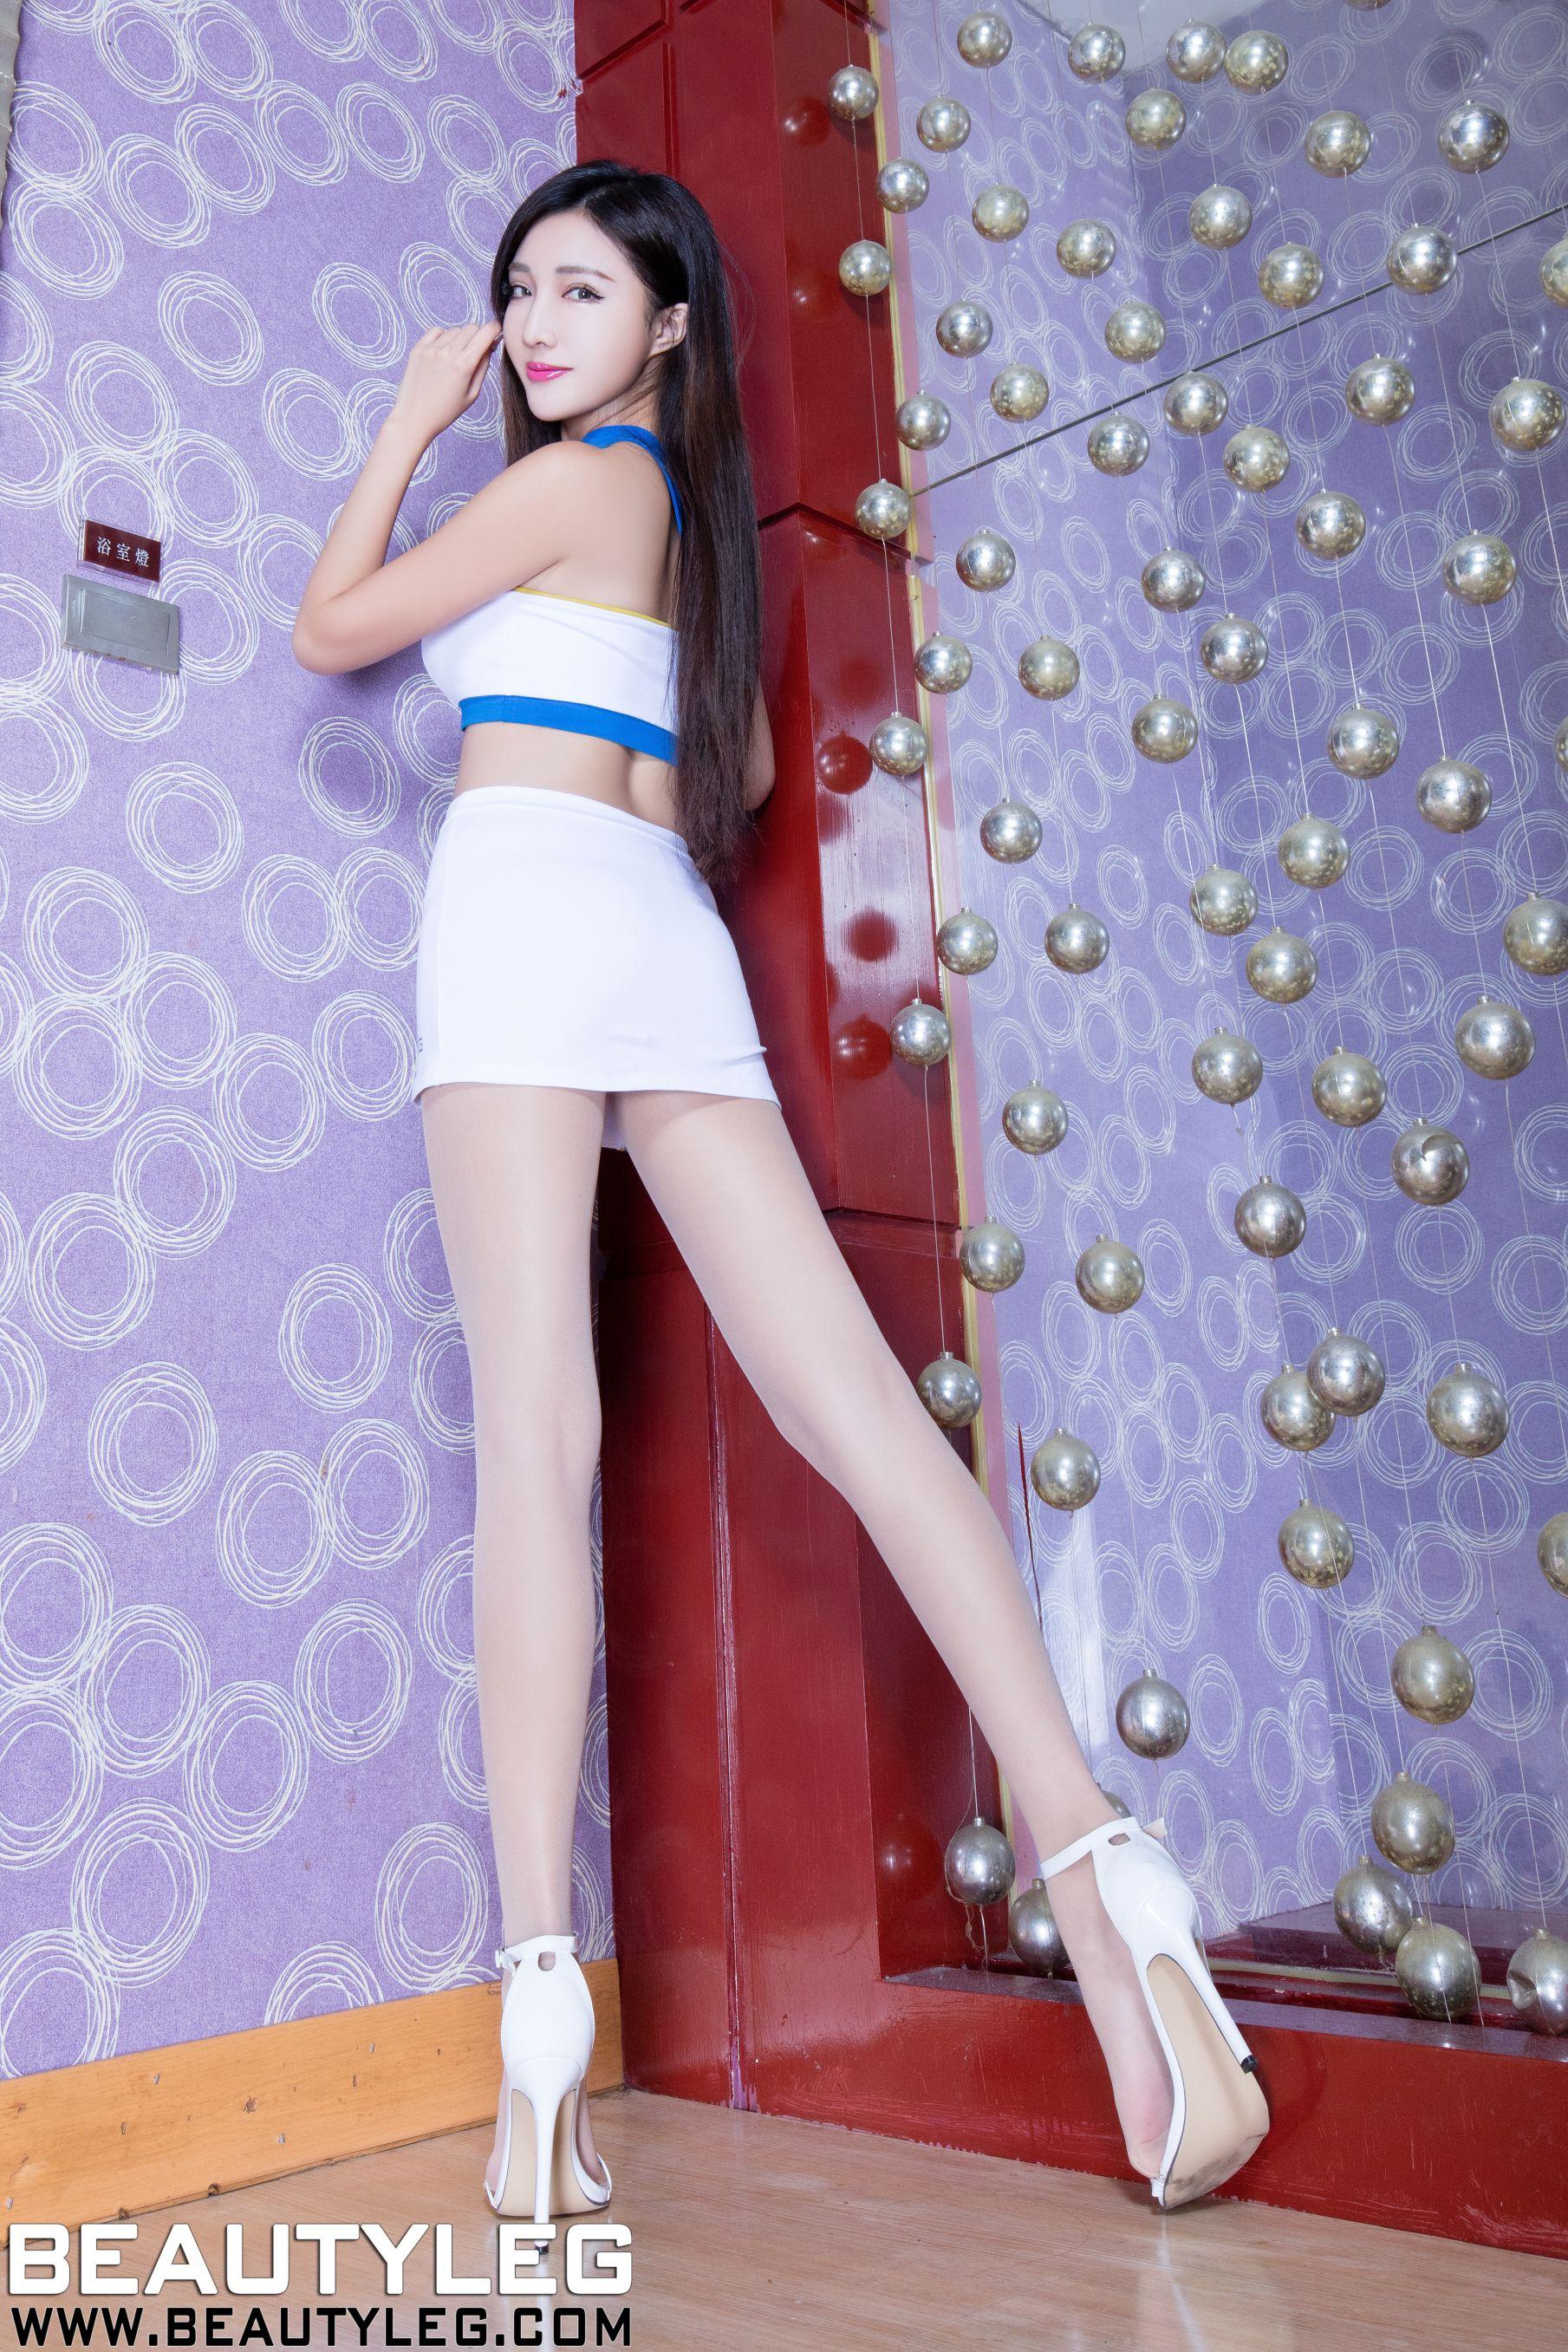 VOL.1540 [Beautyleg]制服丝袜美腿:赵芸(腿模Syuan,Syuan赵芸)高品质写真套图(41P)